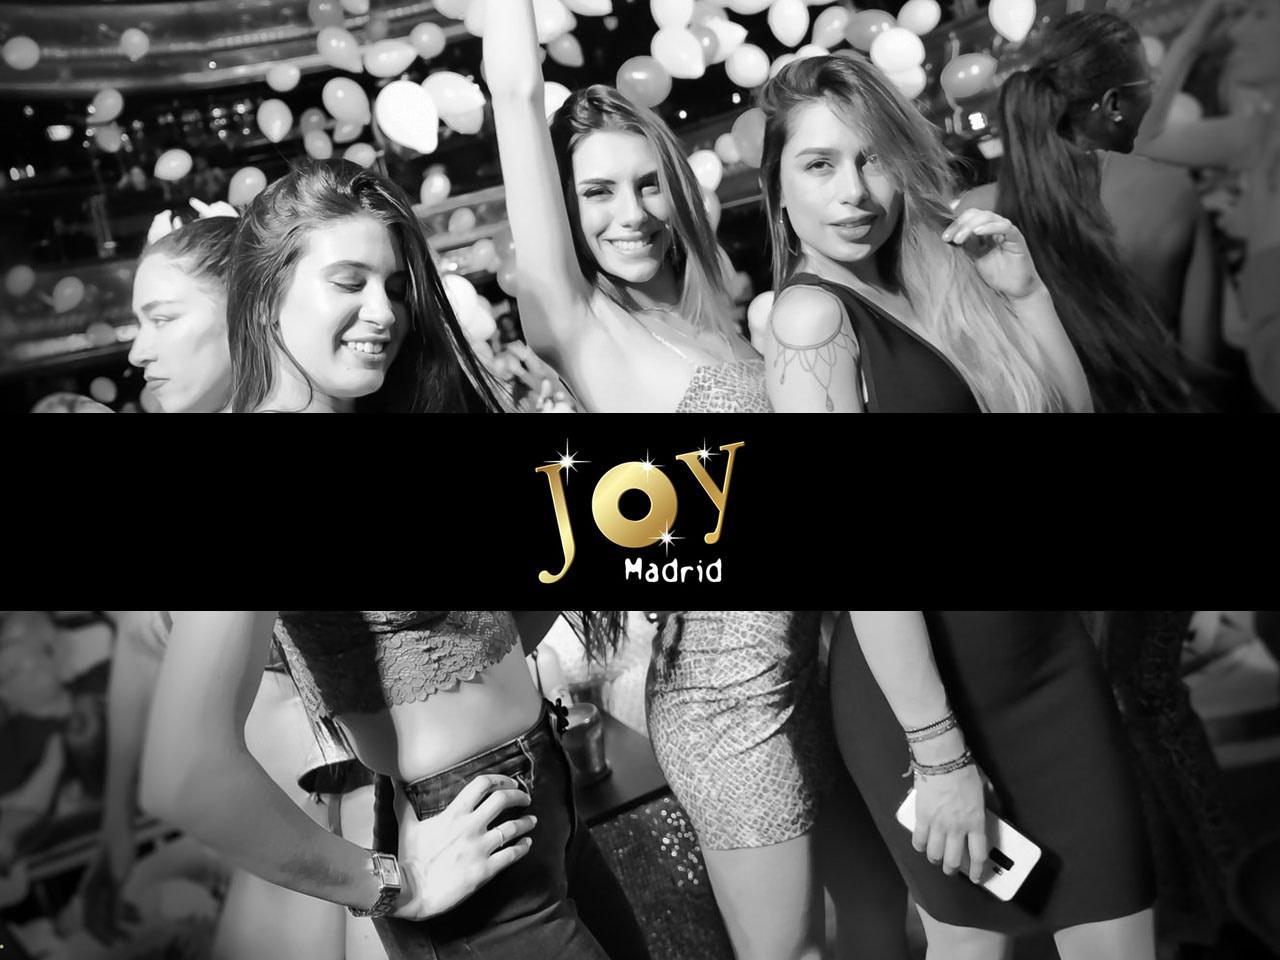 Joy Madrid